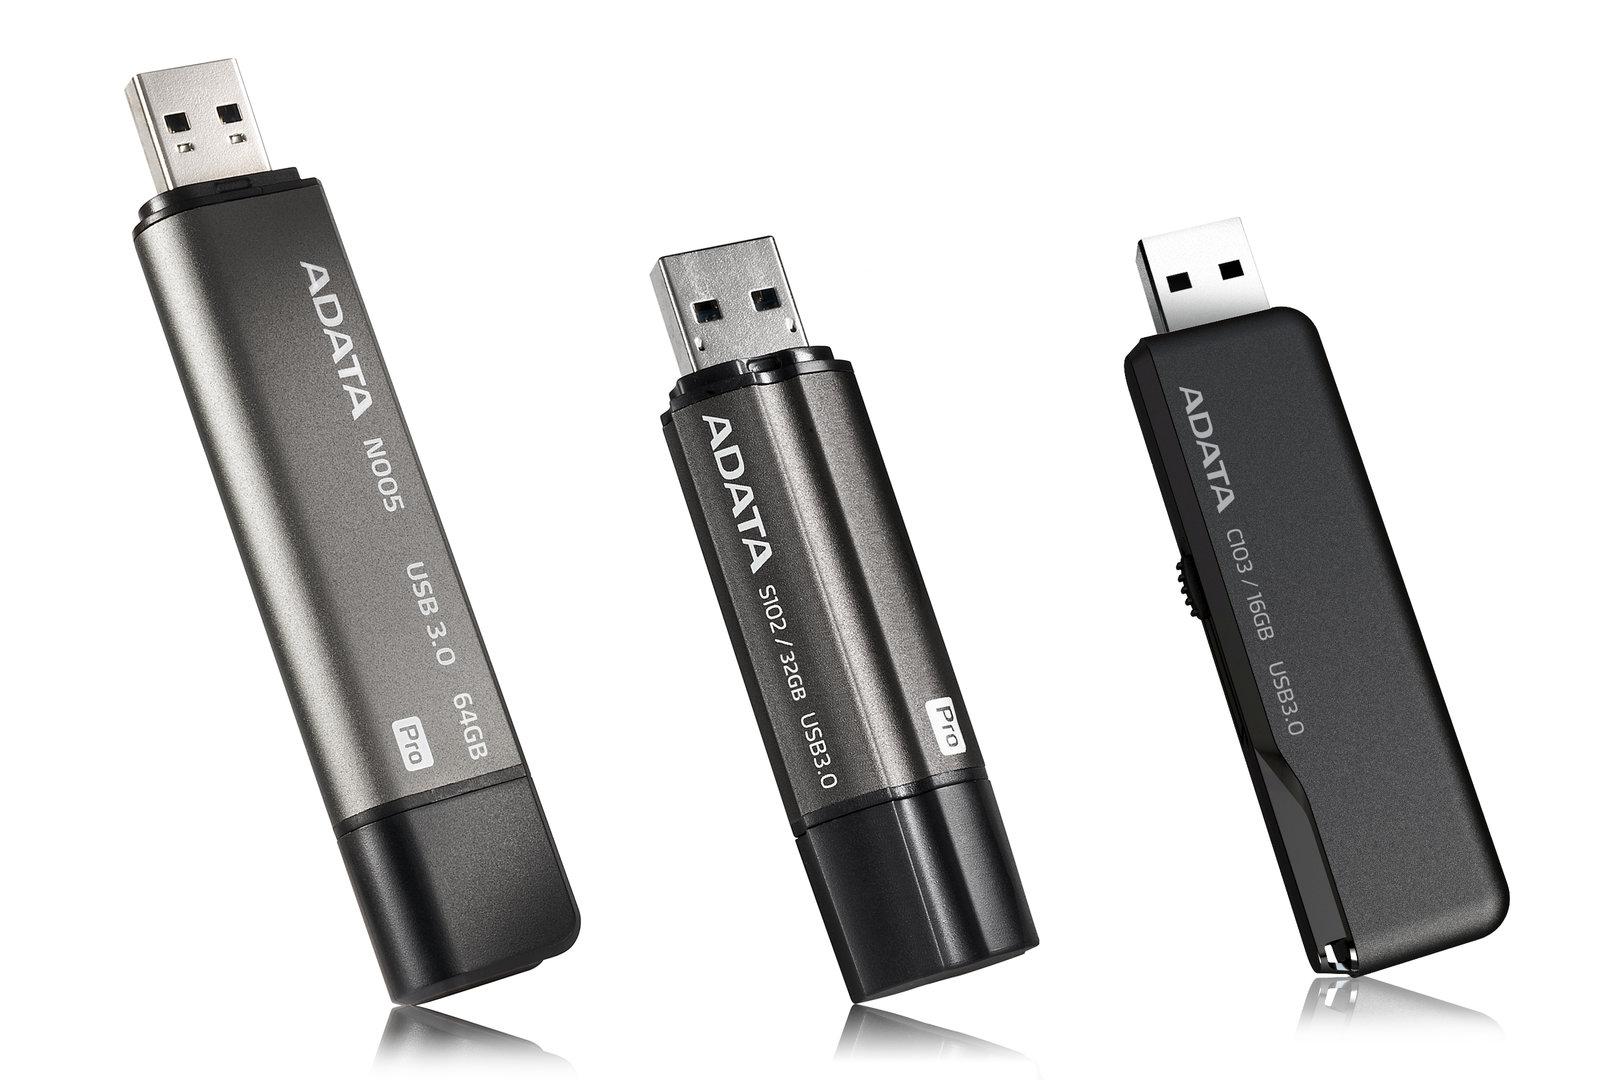 Adatas neue USB-3.0-Sticks